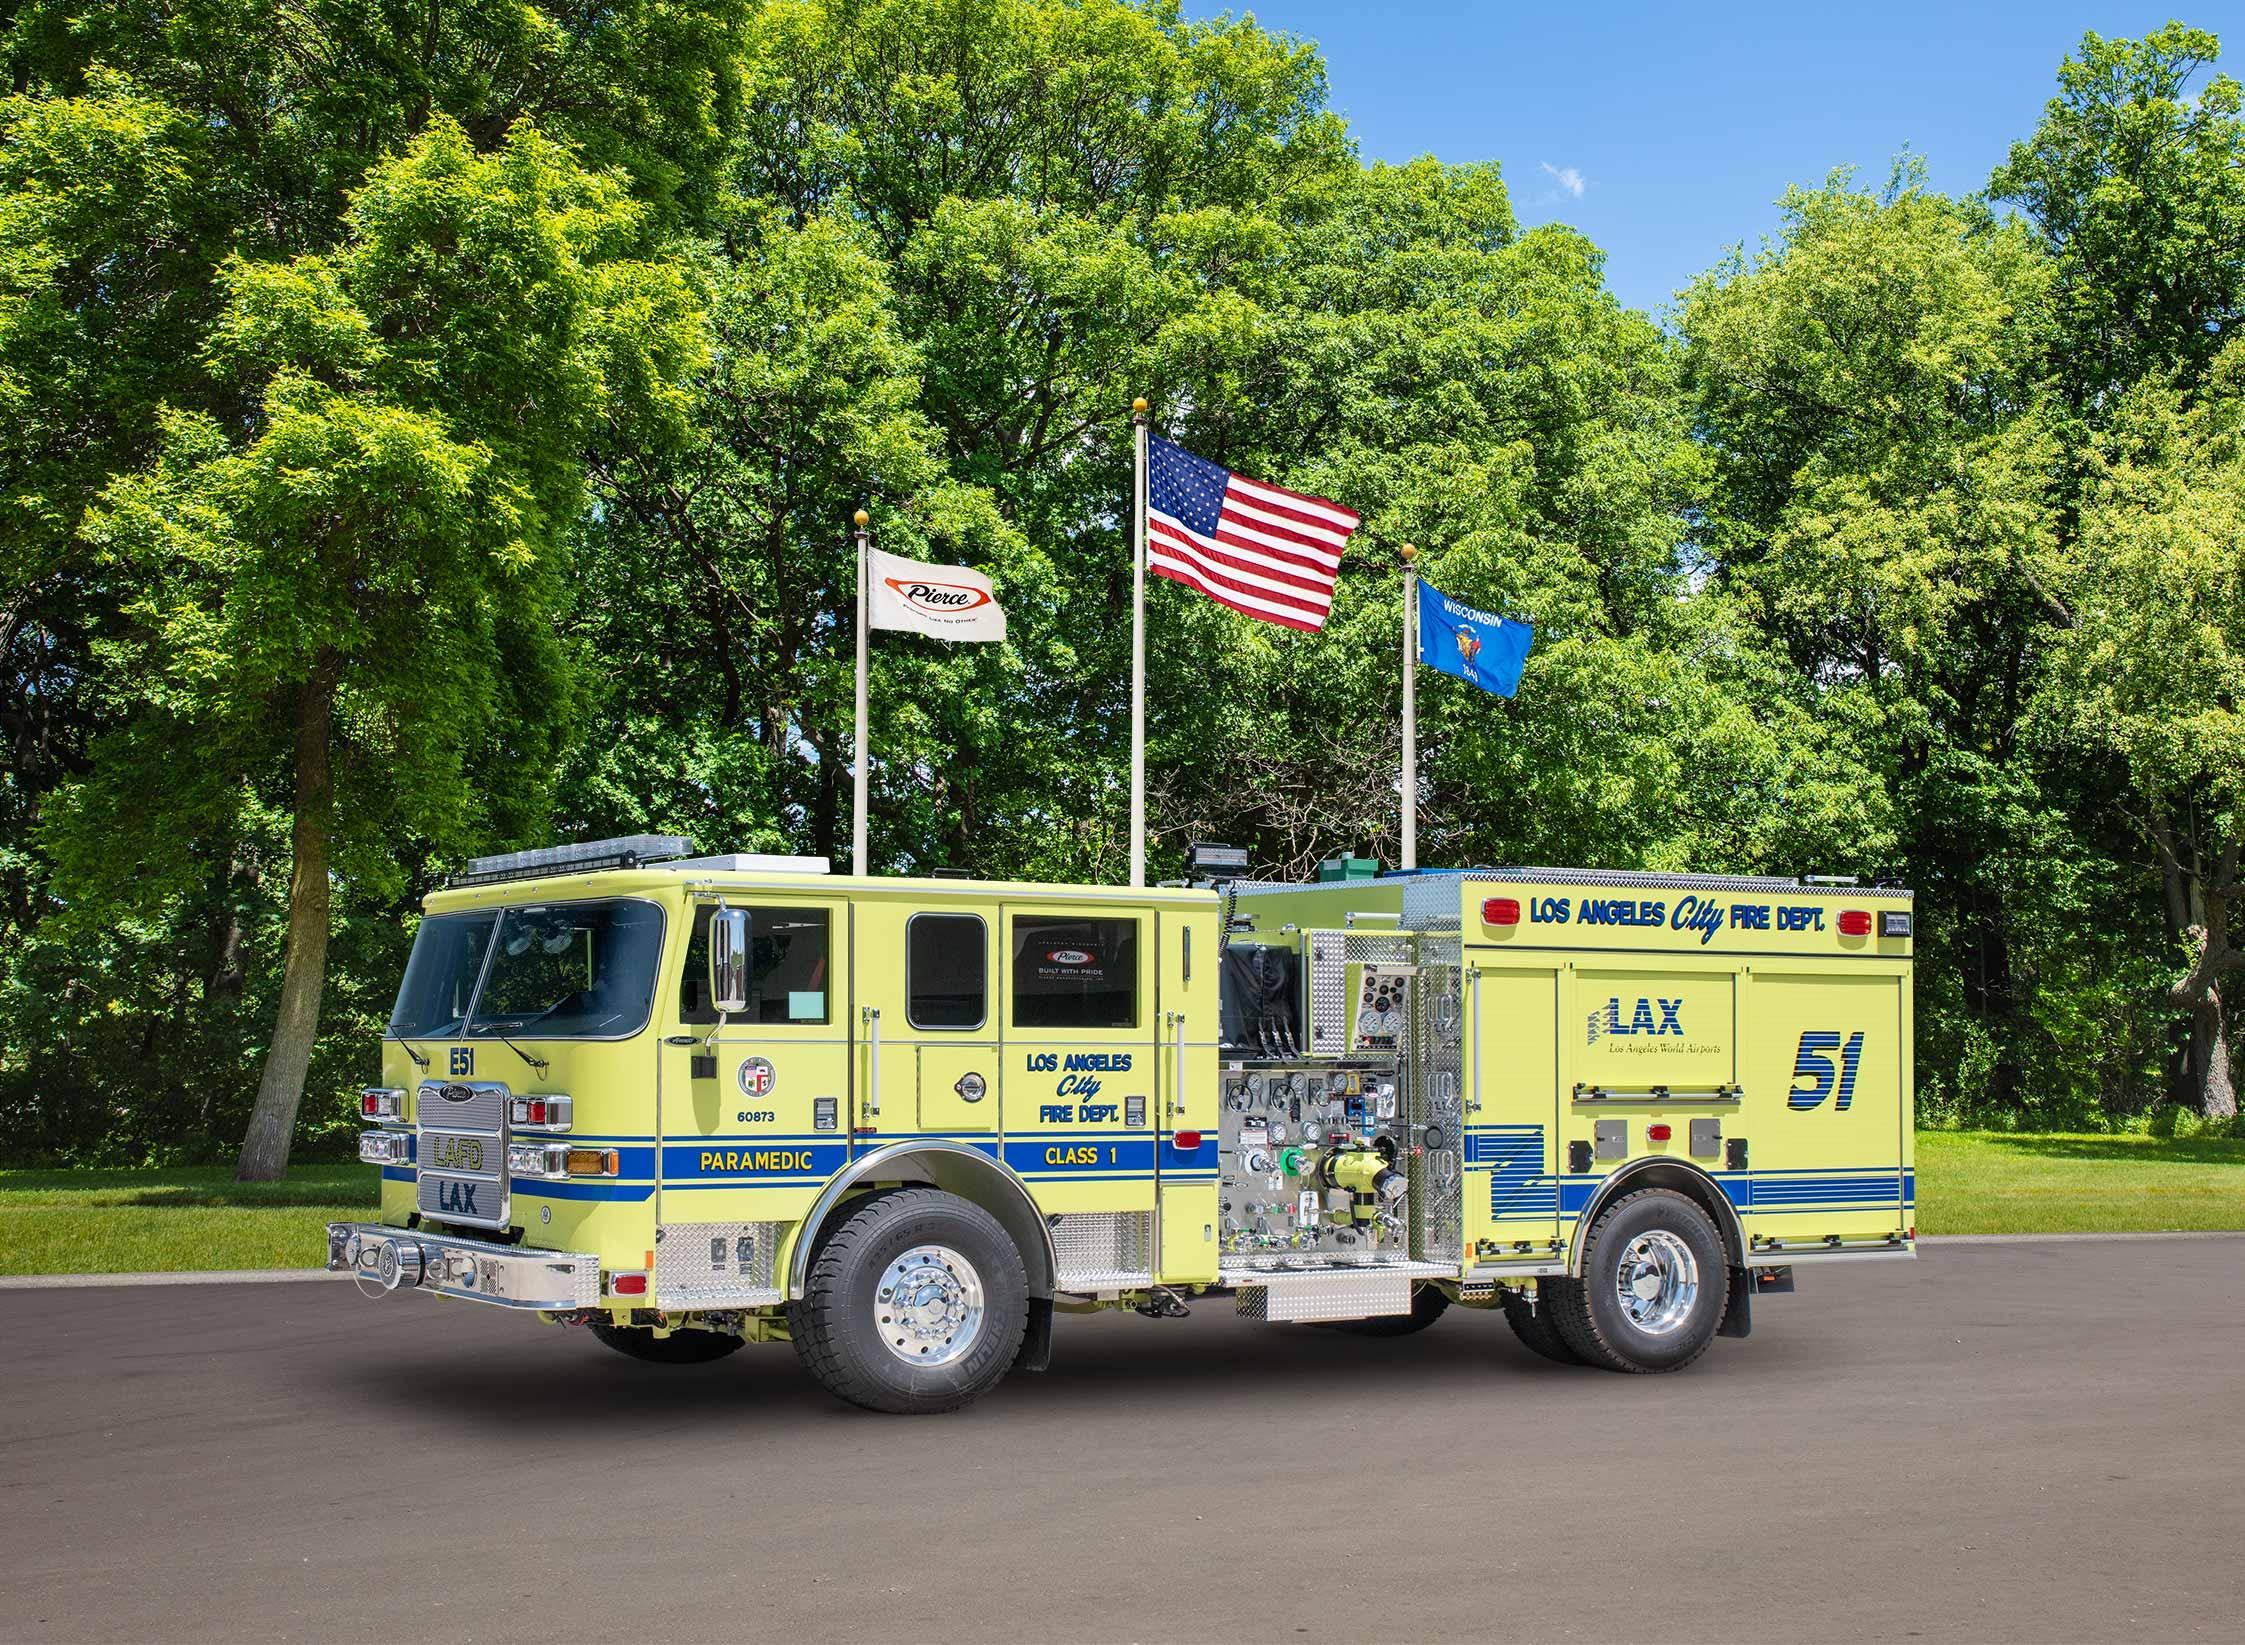 Los Angeles City Fire Department - Pumper